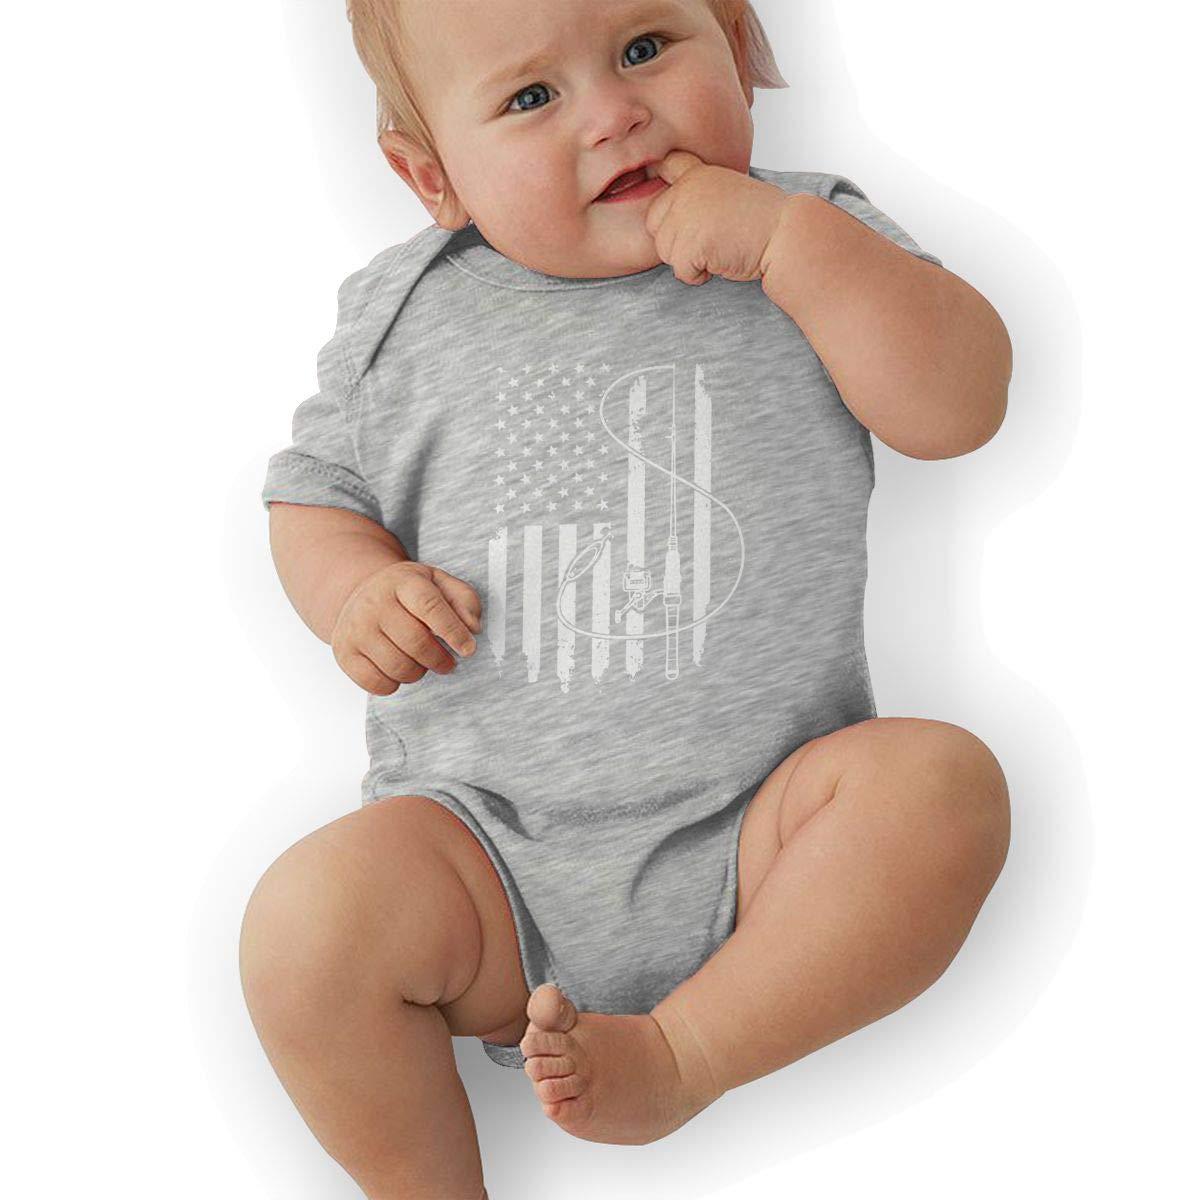 Dfenere Fishing and Fish Flag Hip Hop Newborn Baby Short Sleeve Bodysuit Romper Infant Summer Clothing